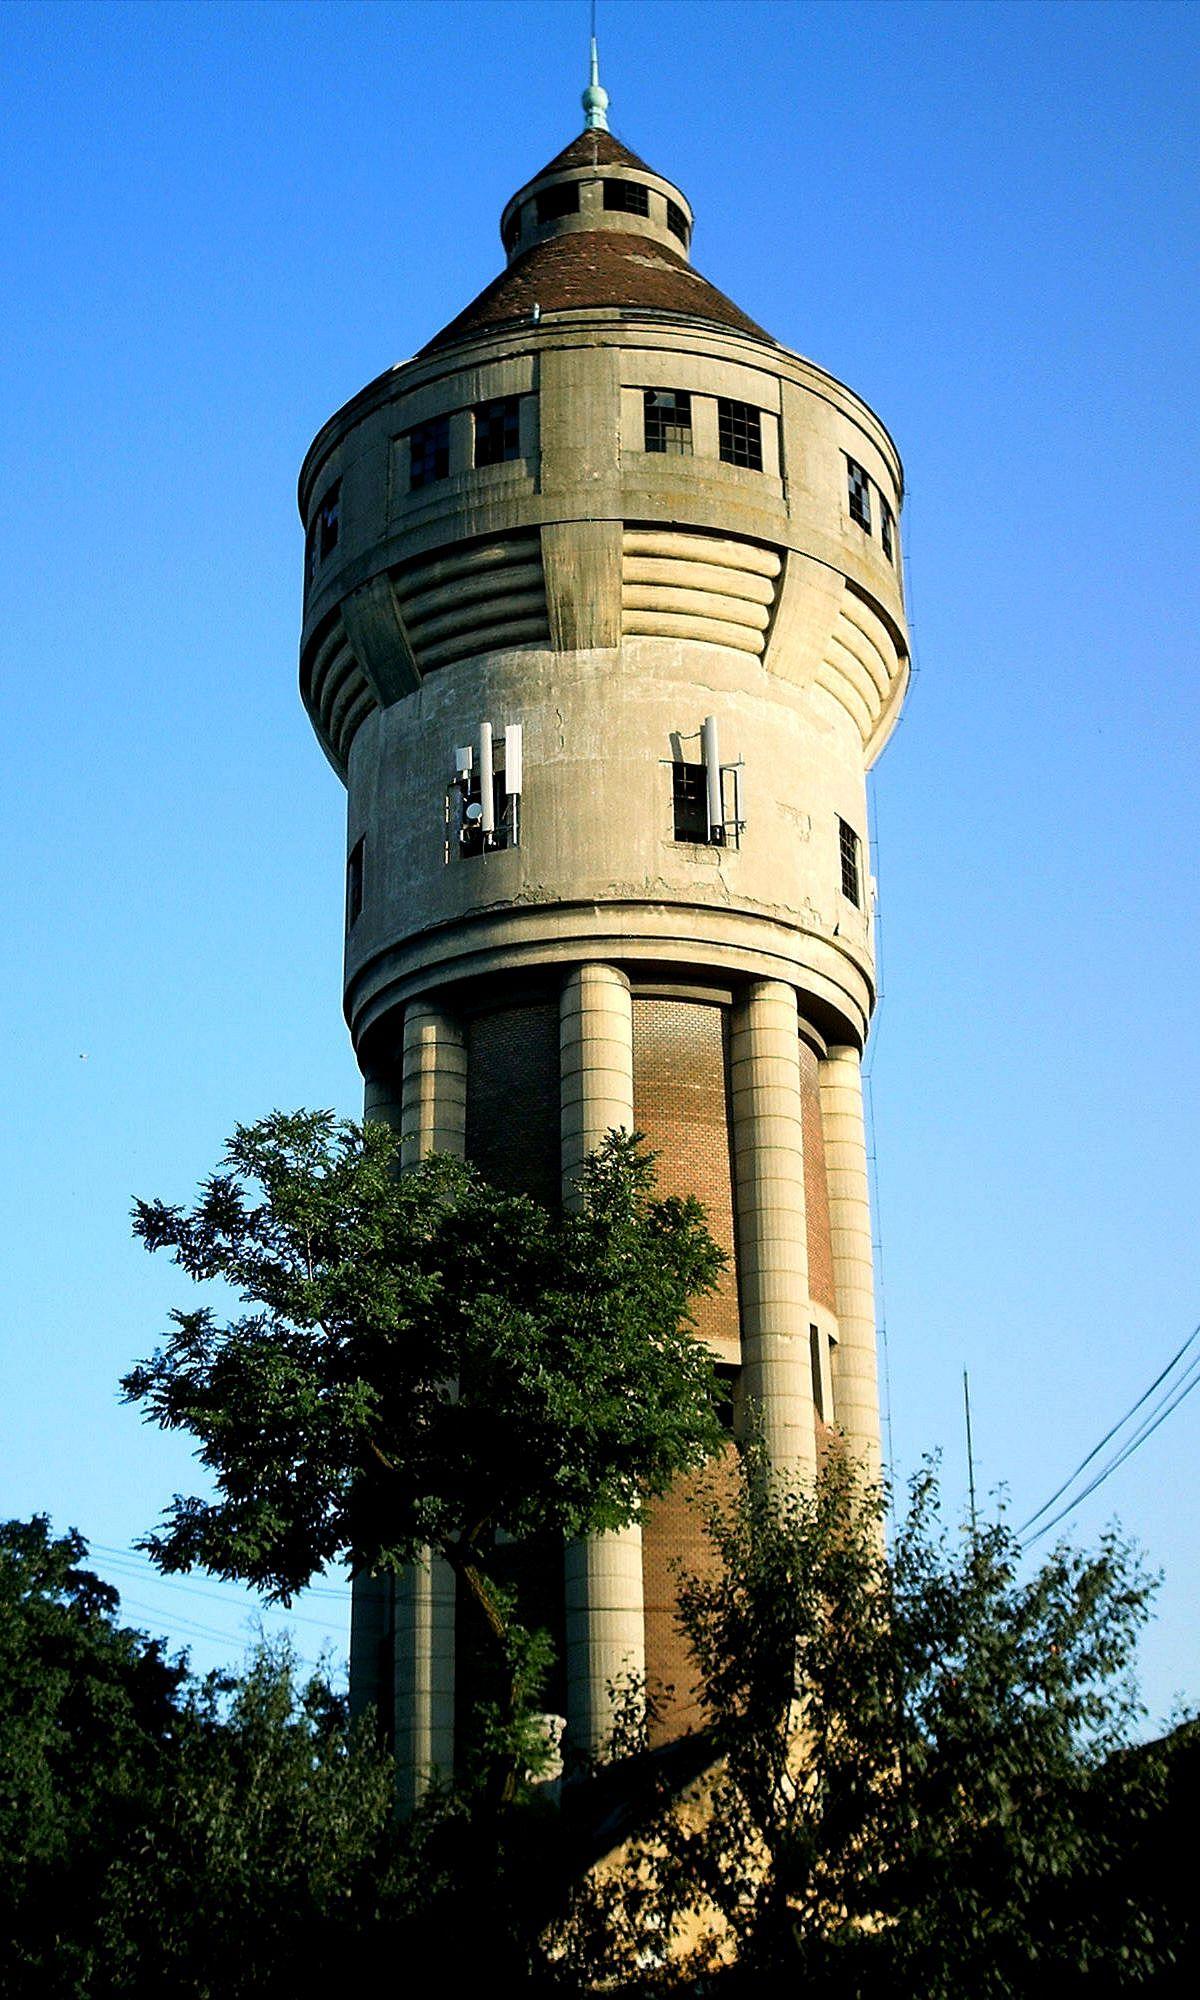 Wasserturm (Iosefin)